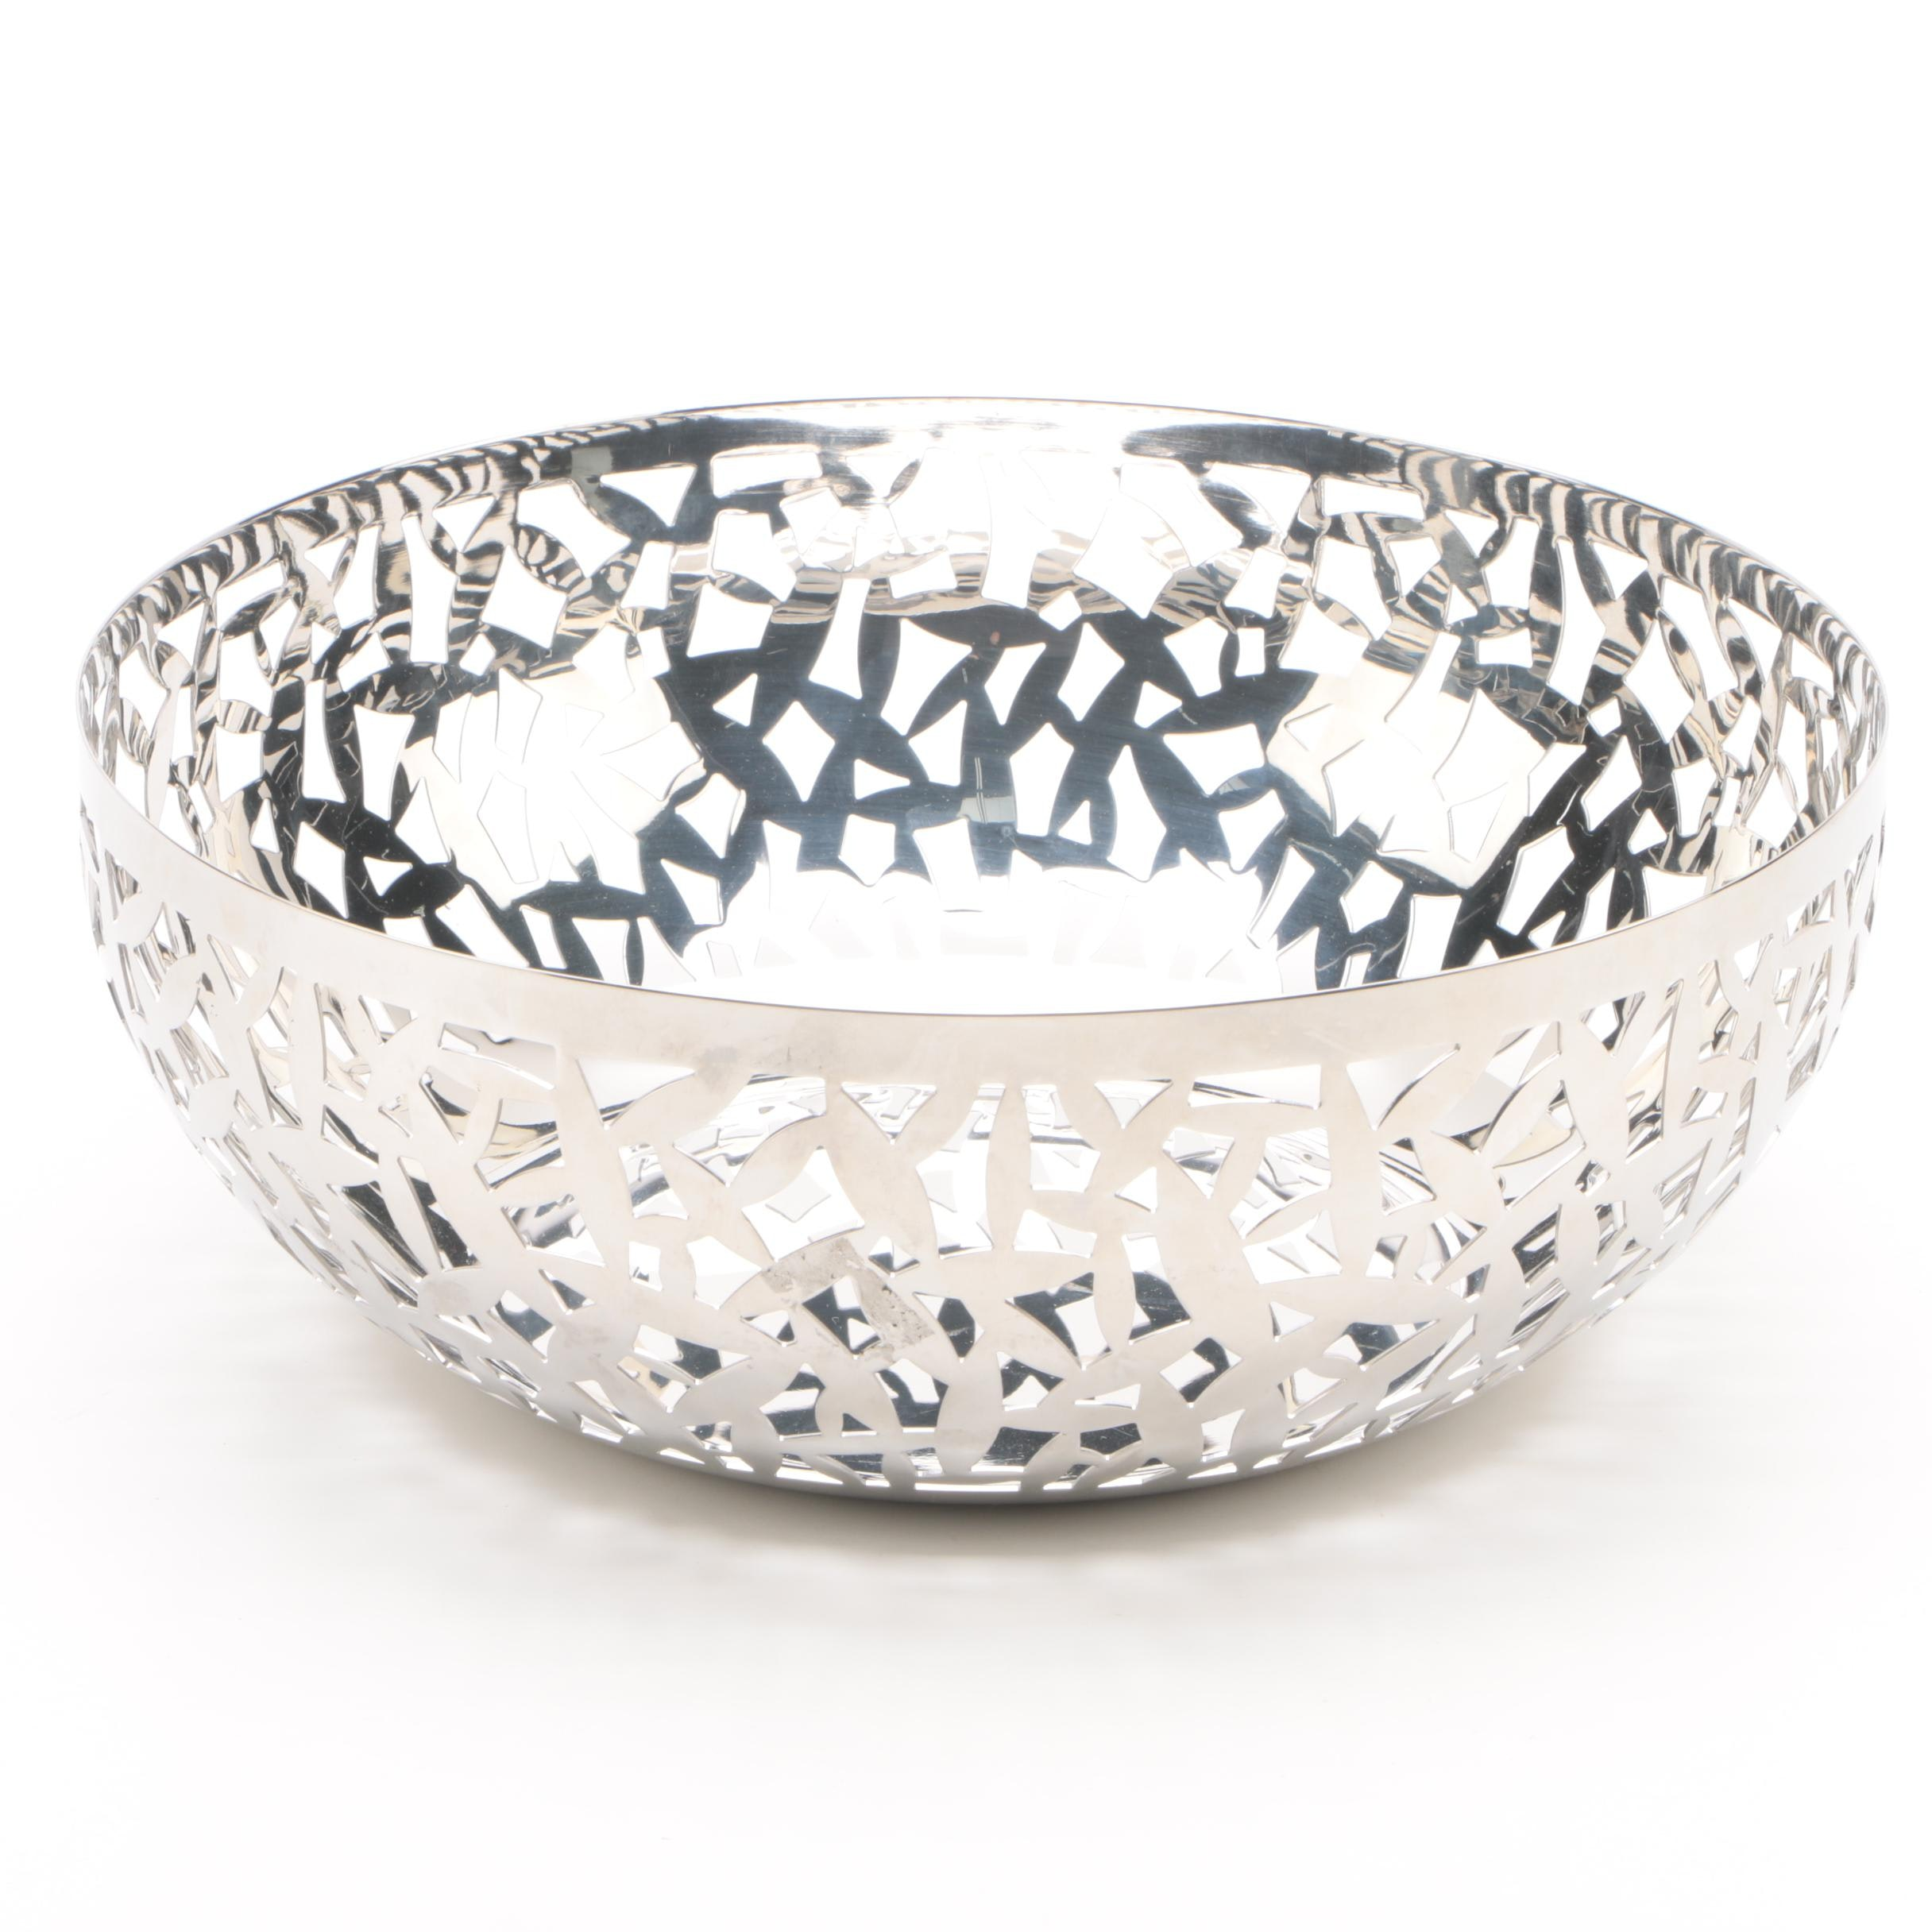 "Alessi ""Cactus"" Pierced Bowl by Marta Sansoni"